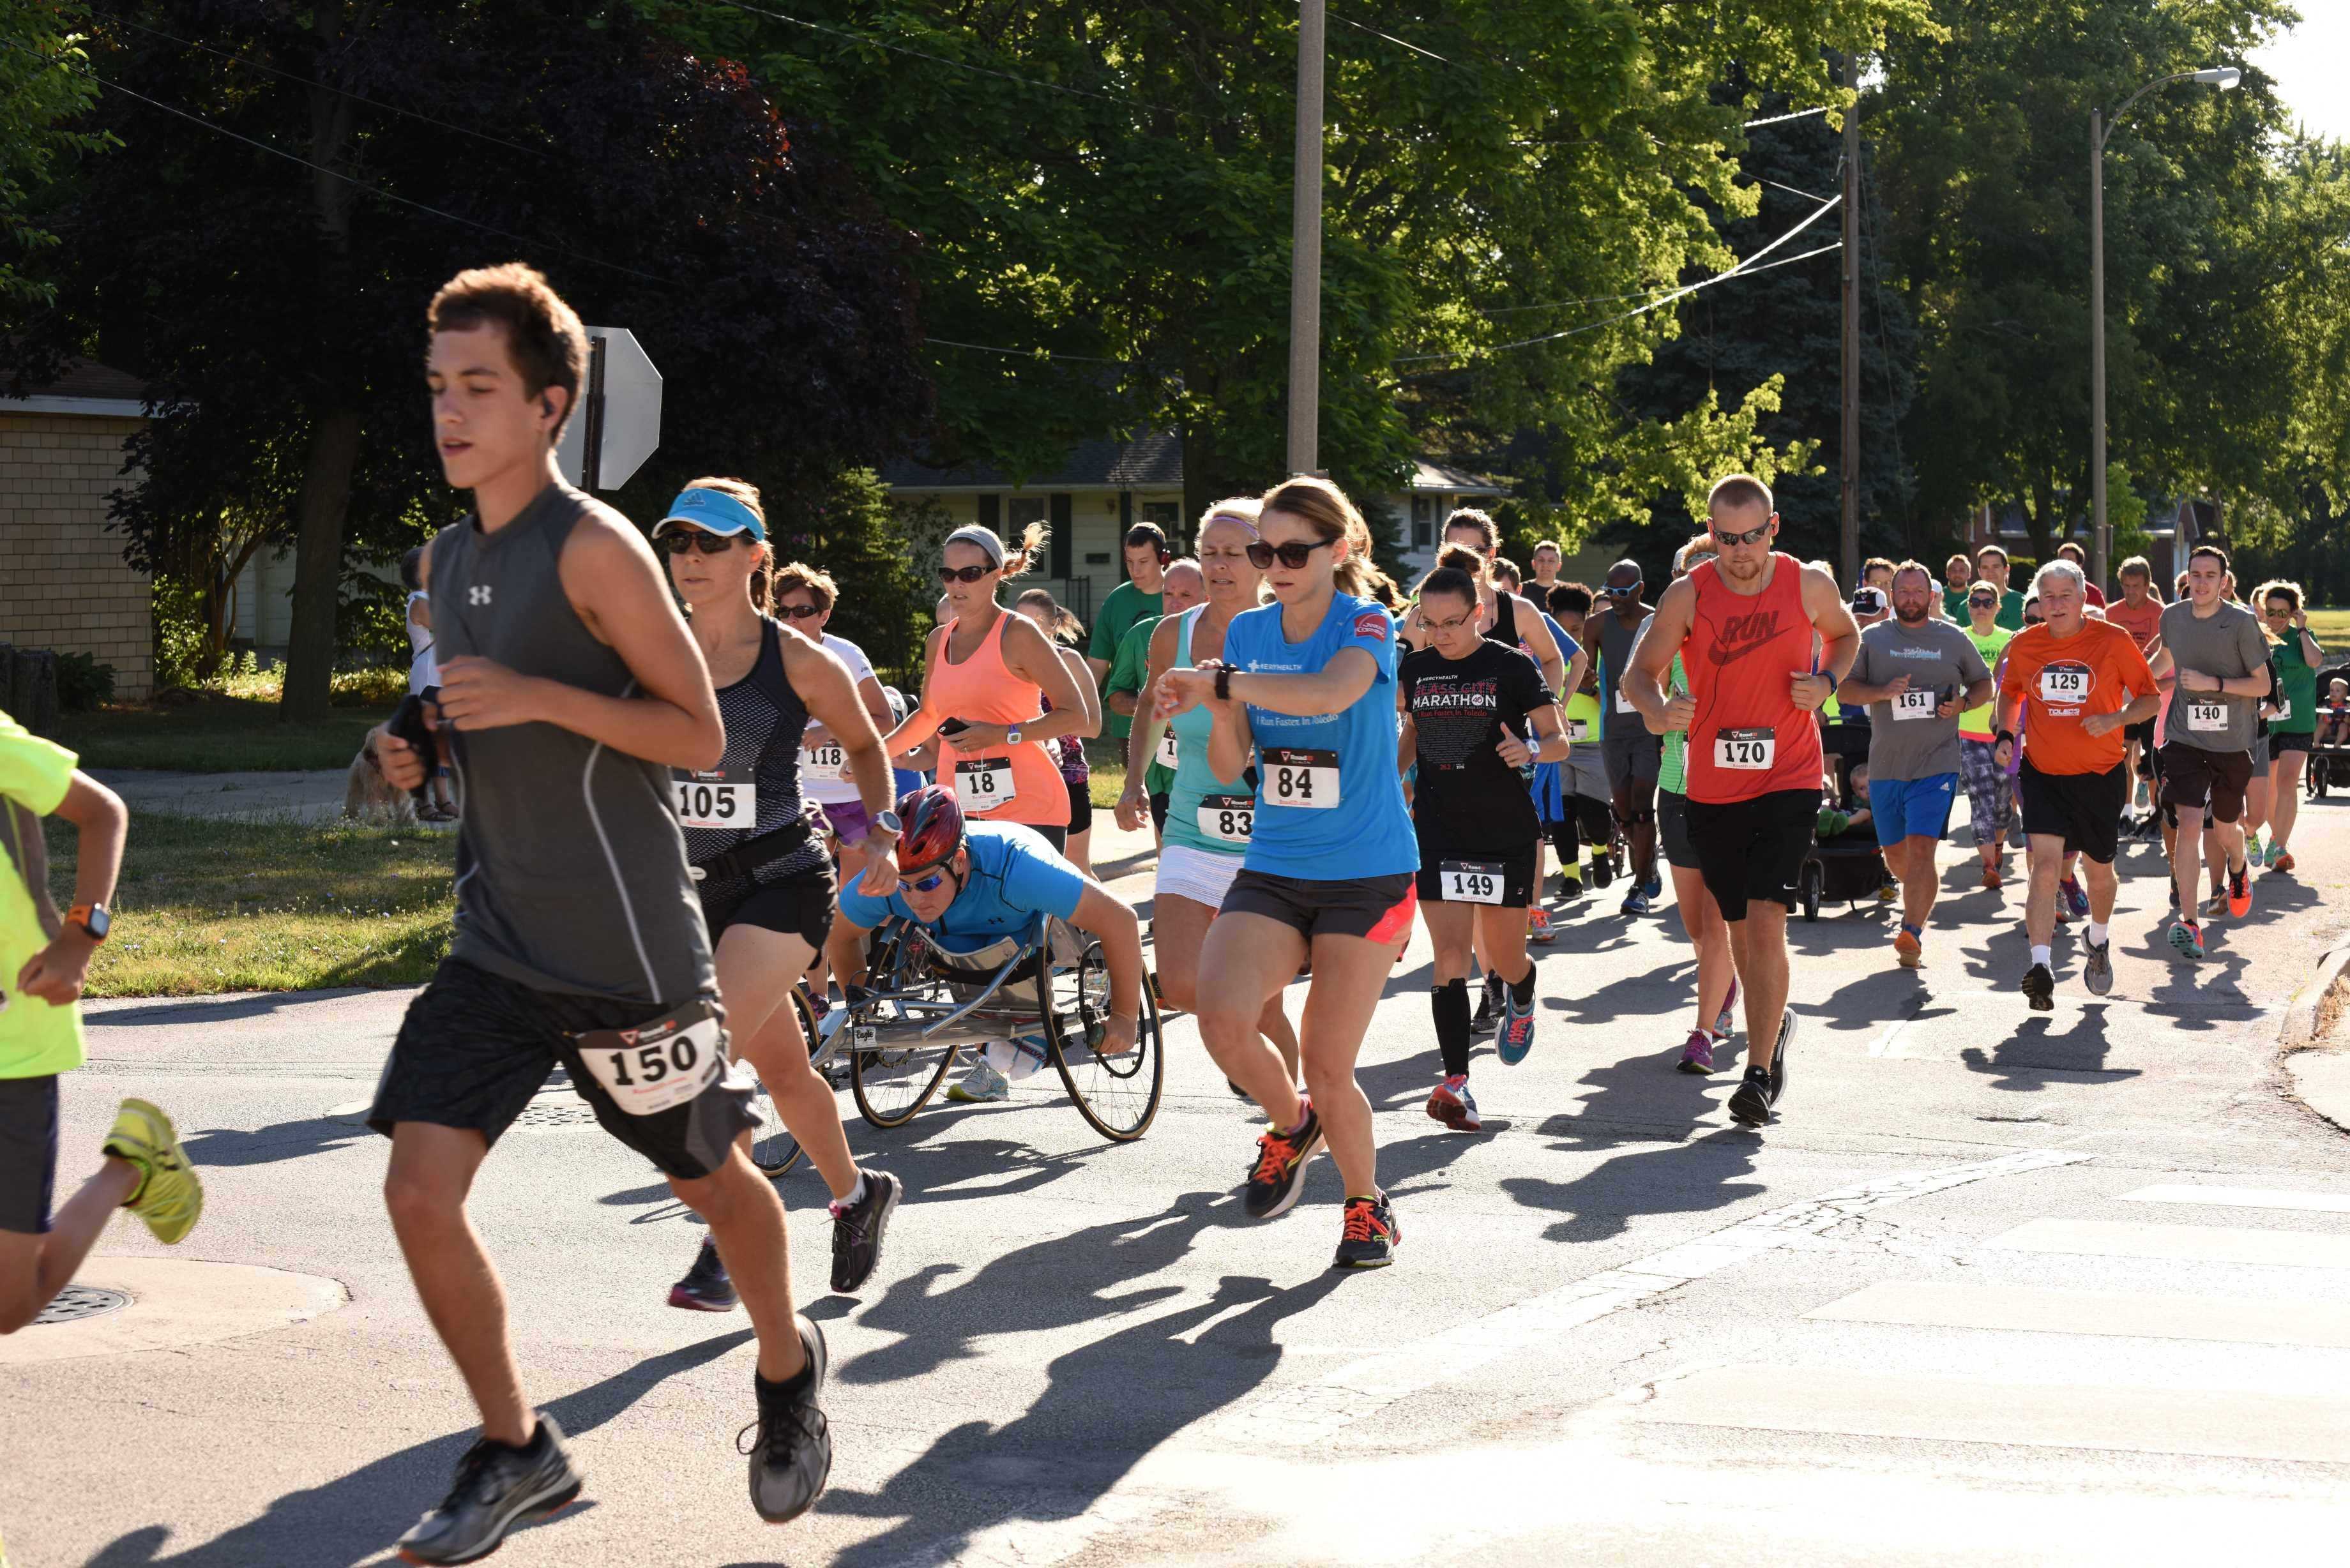 2016 Feet on the Street 5k Race